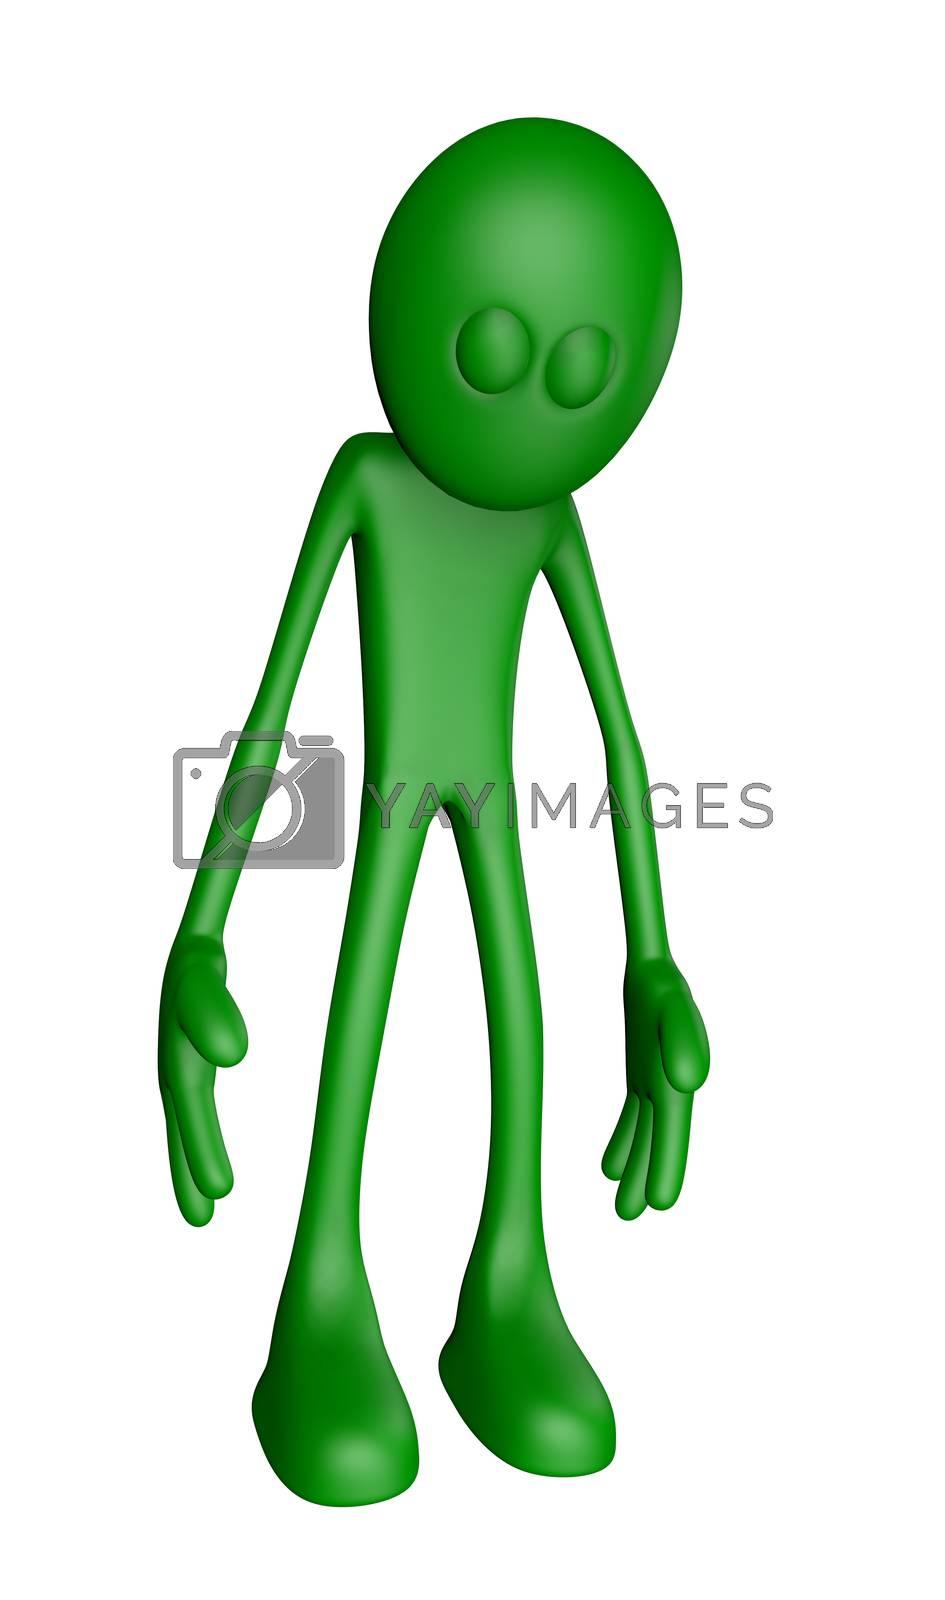 sad green guy - 3d illustration